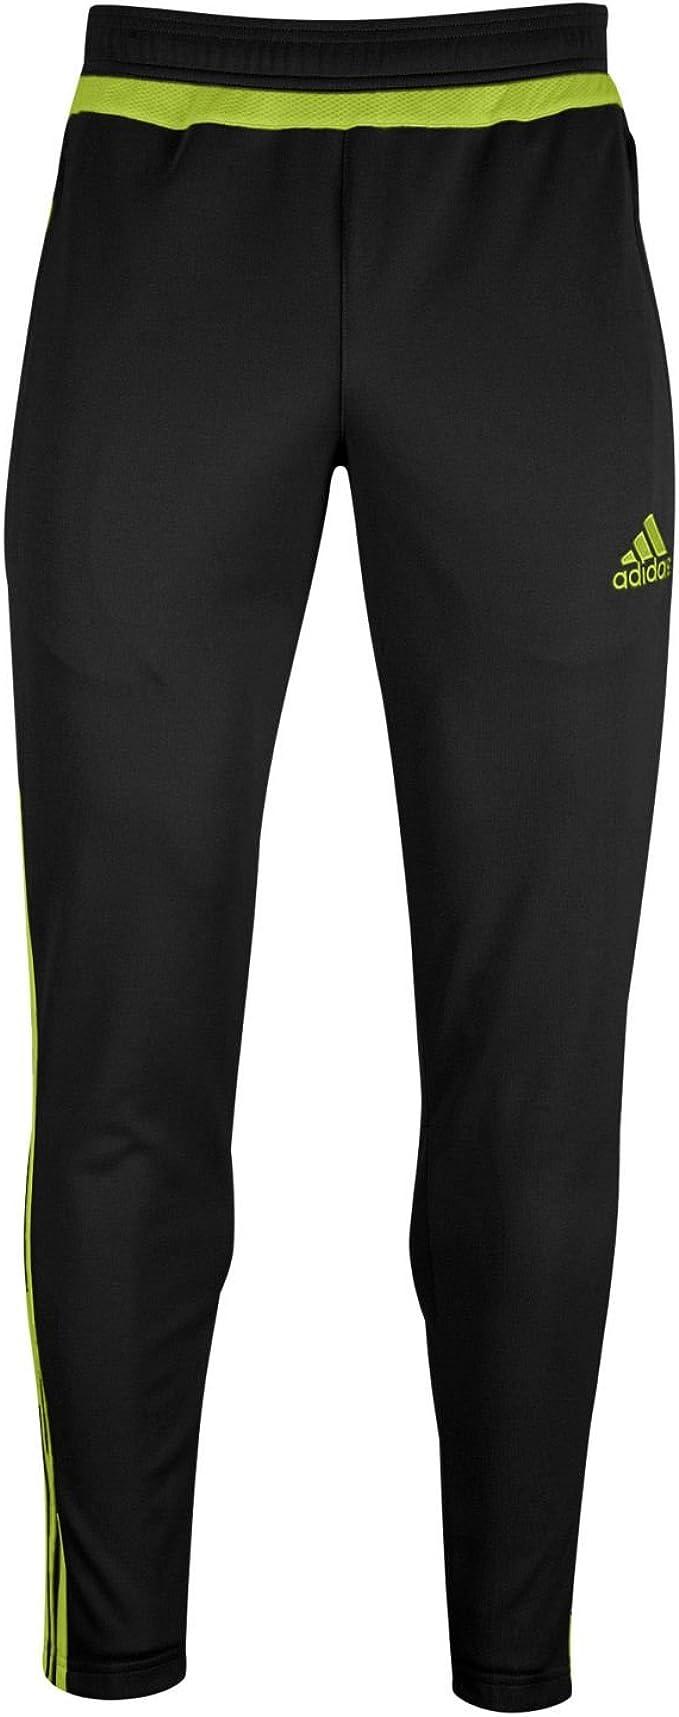 adidas Training Wear adidas Tiro 15 Training Pants Black